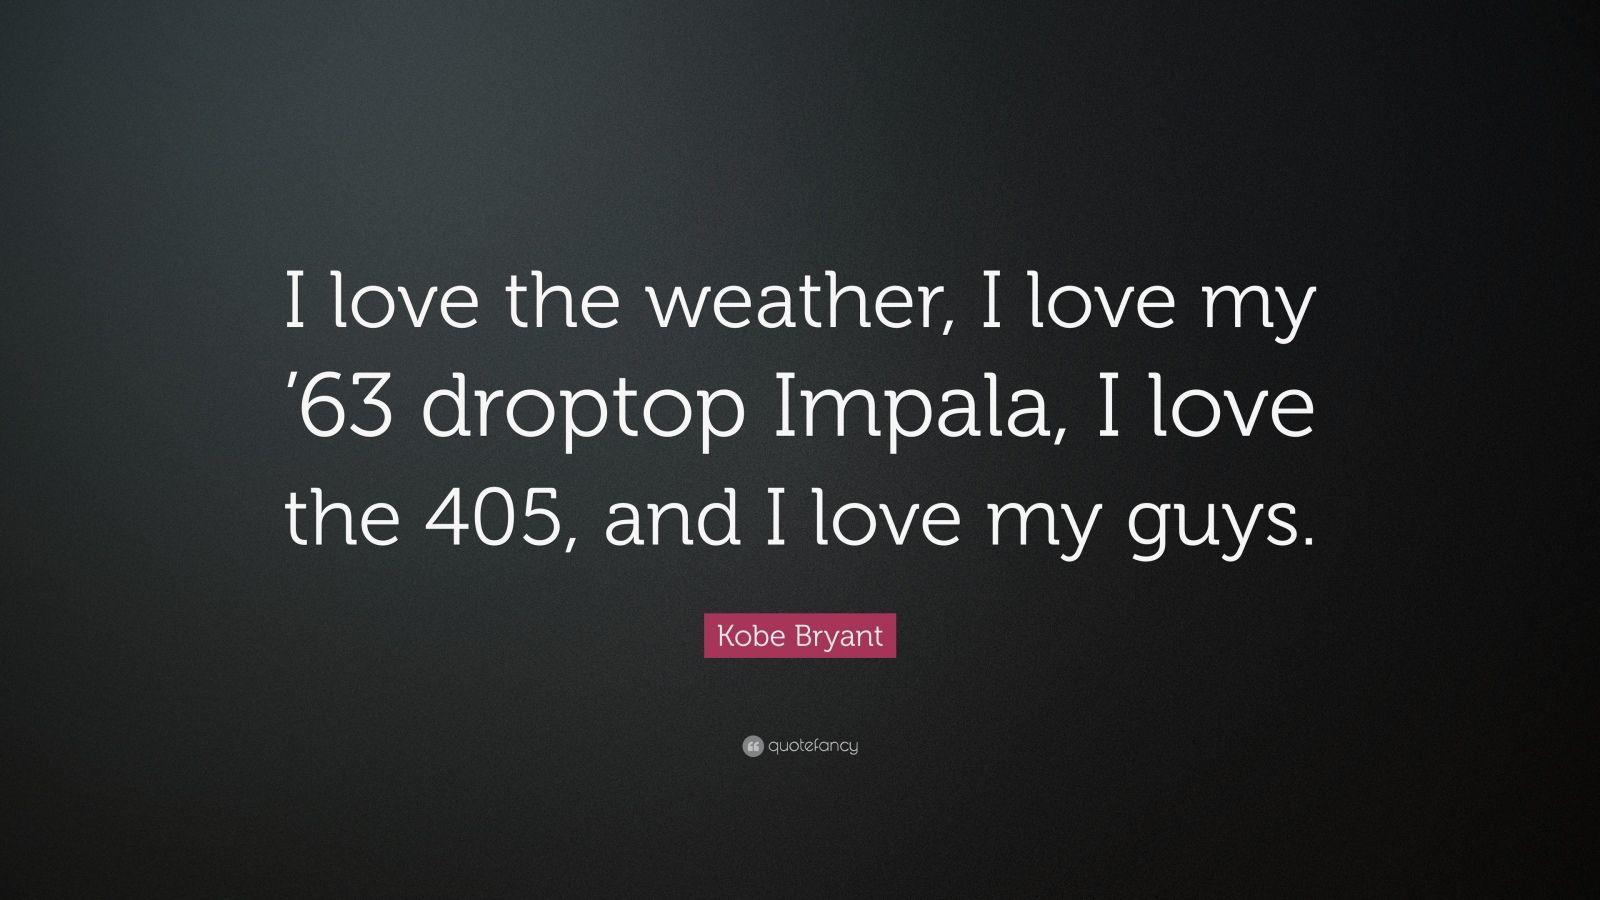 "Kobe Bryant Quote: ""I love the weather, I love my '63 droptop Impala, I love the 405, and I love my guys."""